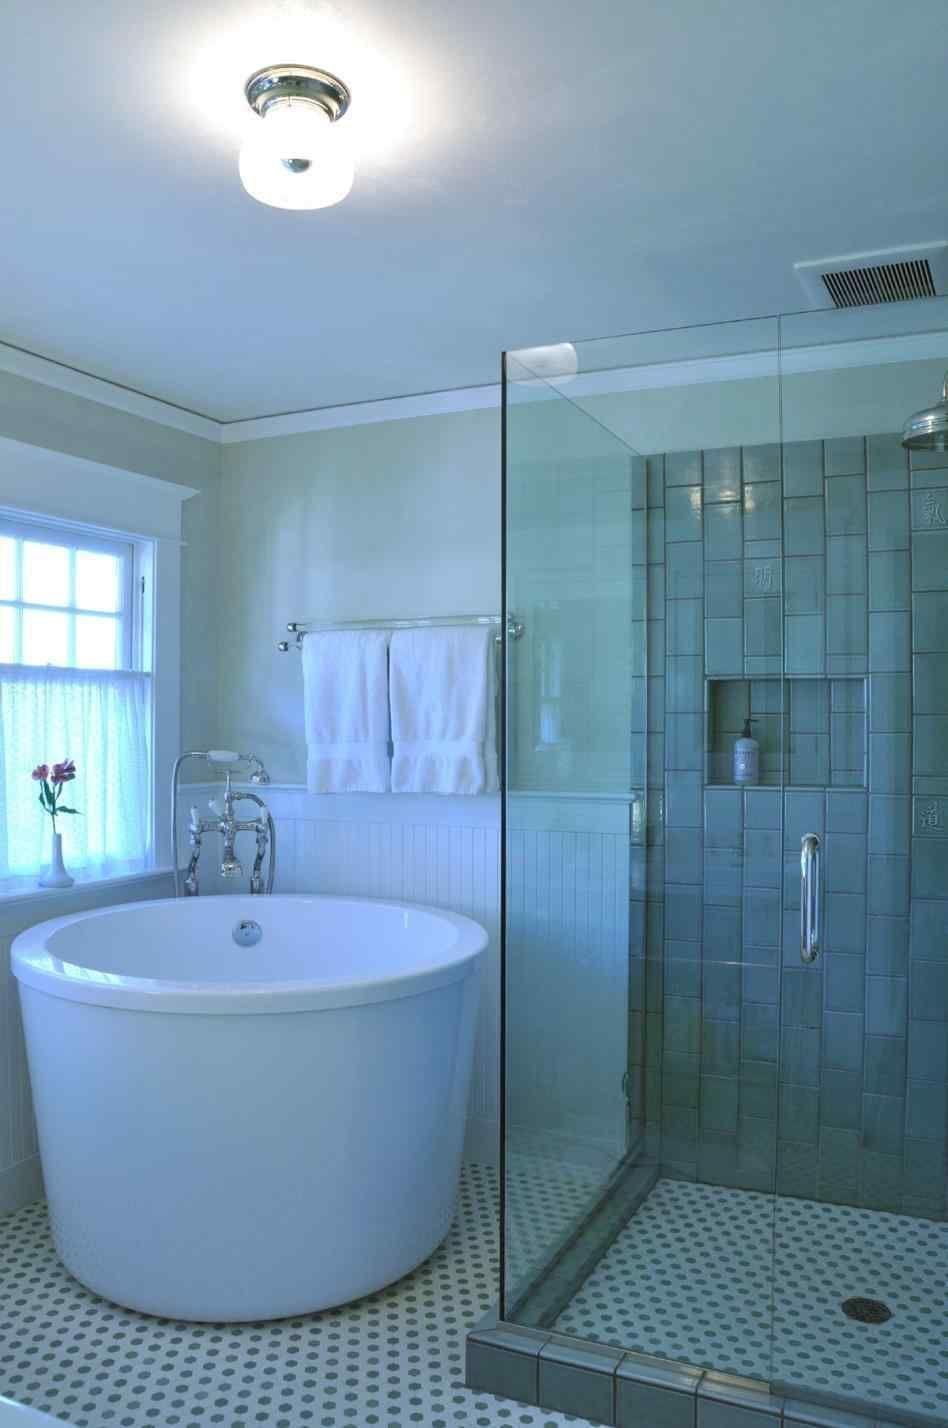 Stunning European Interior Ideas To Inspire Yourself 38 In 2020 Soaking Tub Shower Combo Bathroom Design Small Modern Small Soaking Tub